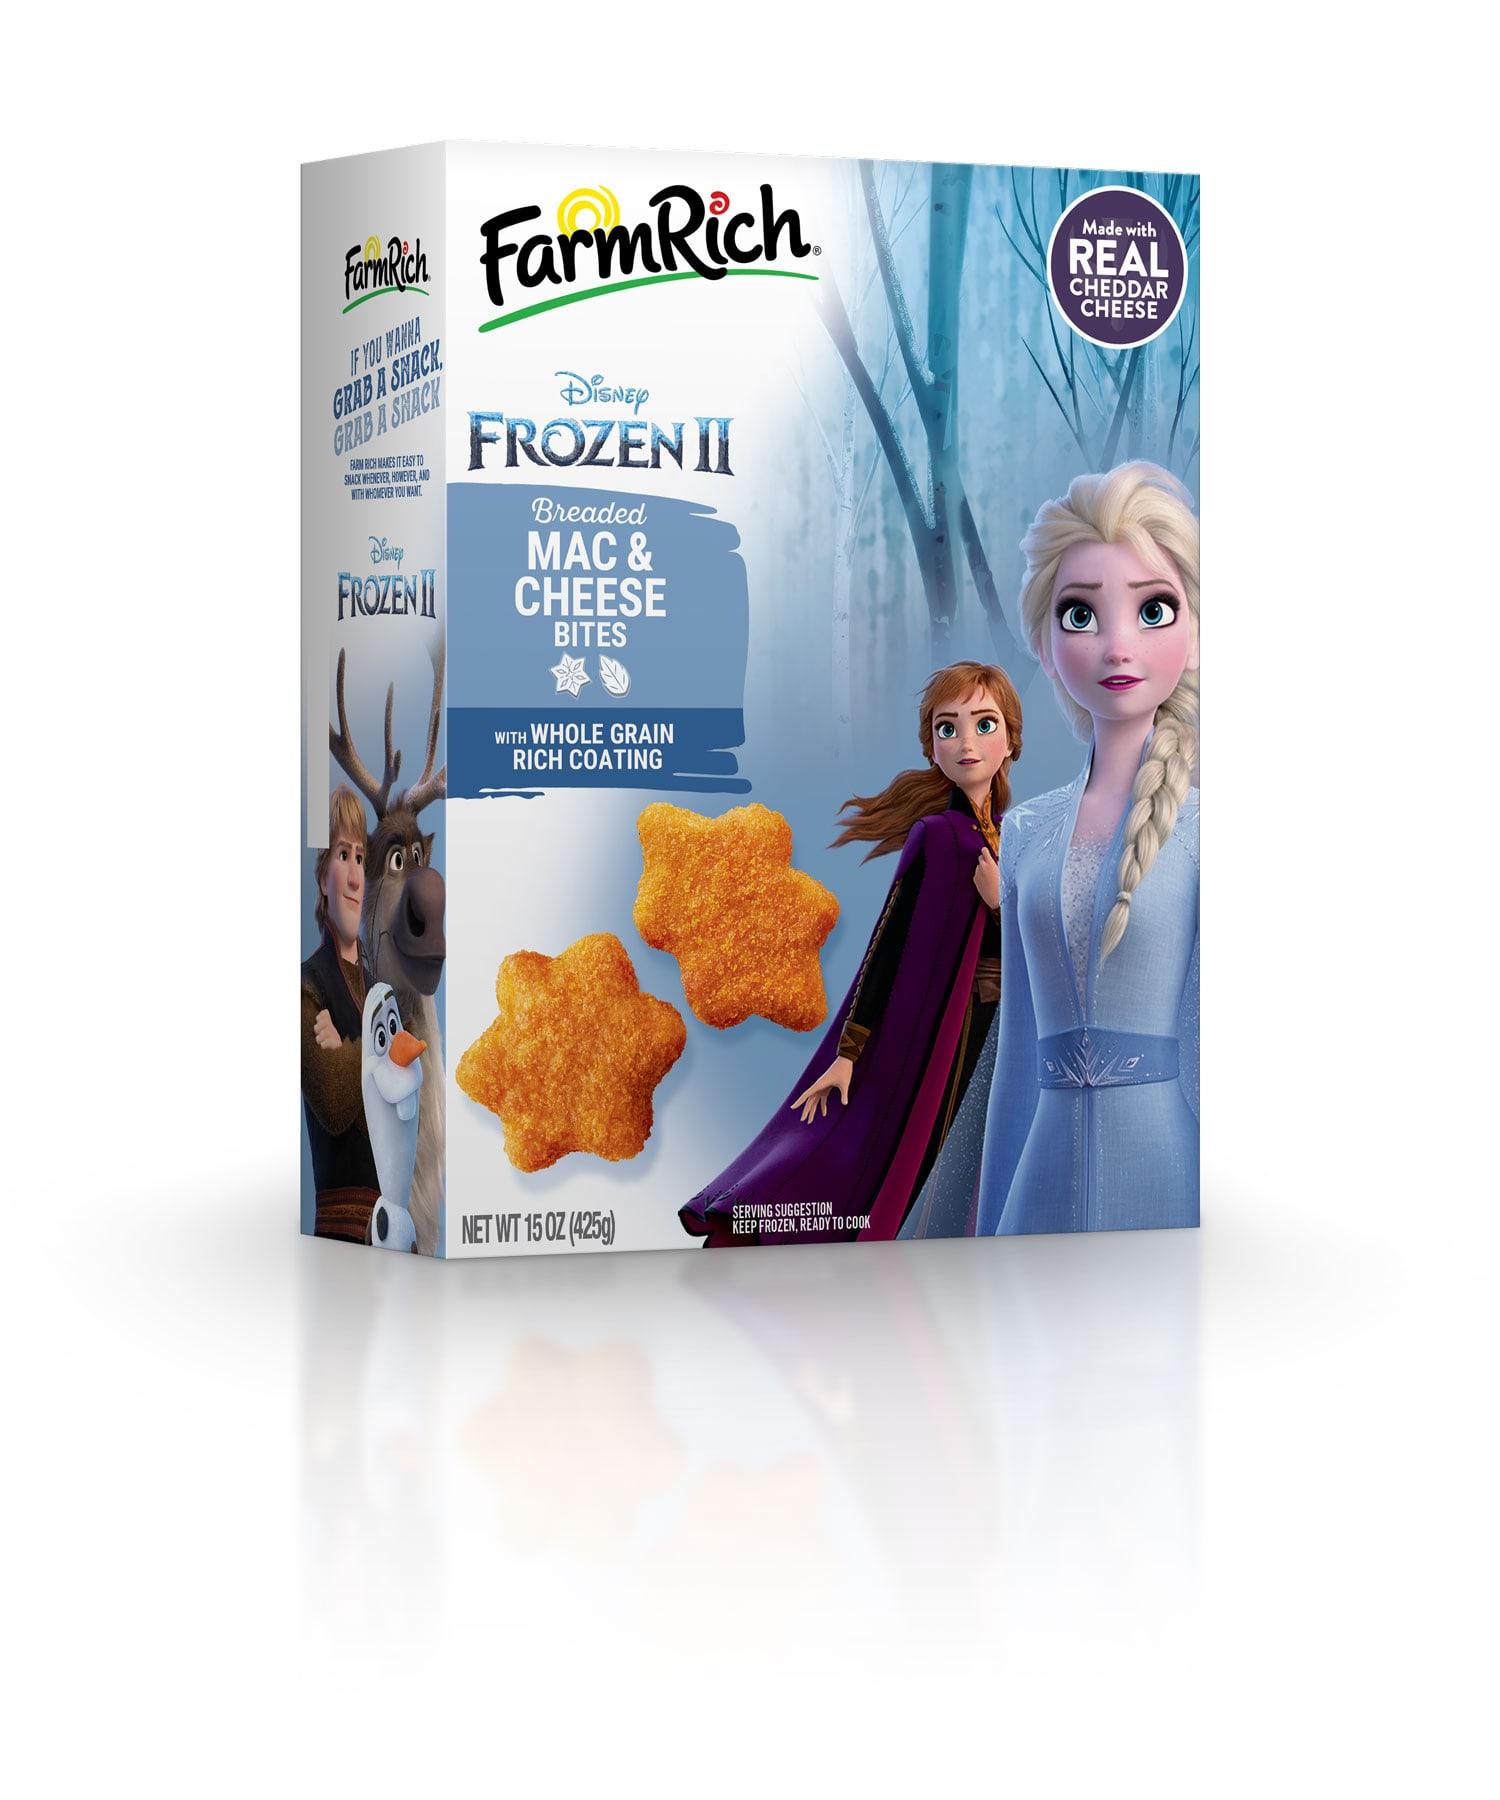 Disney's Frozen 2 Mac & Cheese Bites